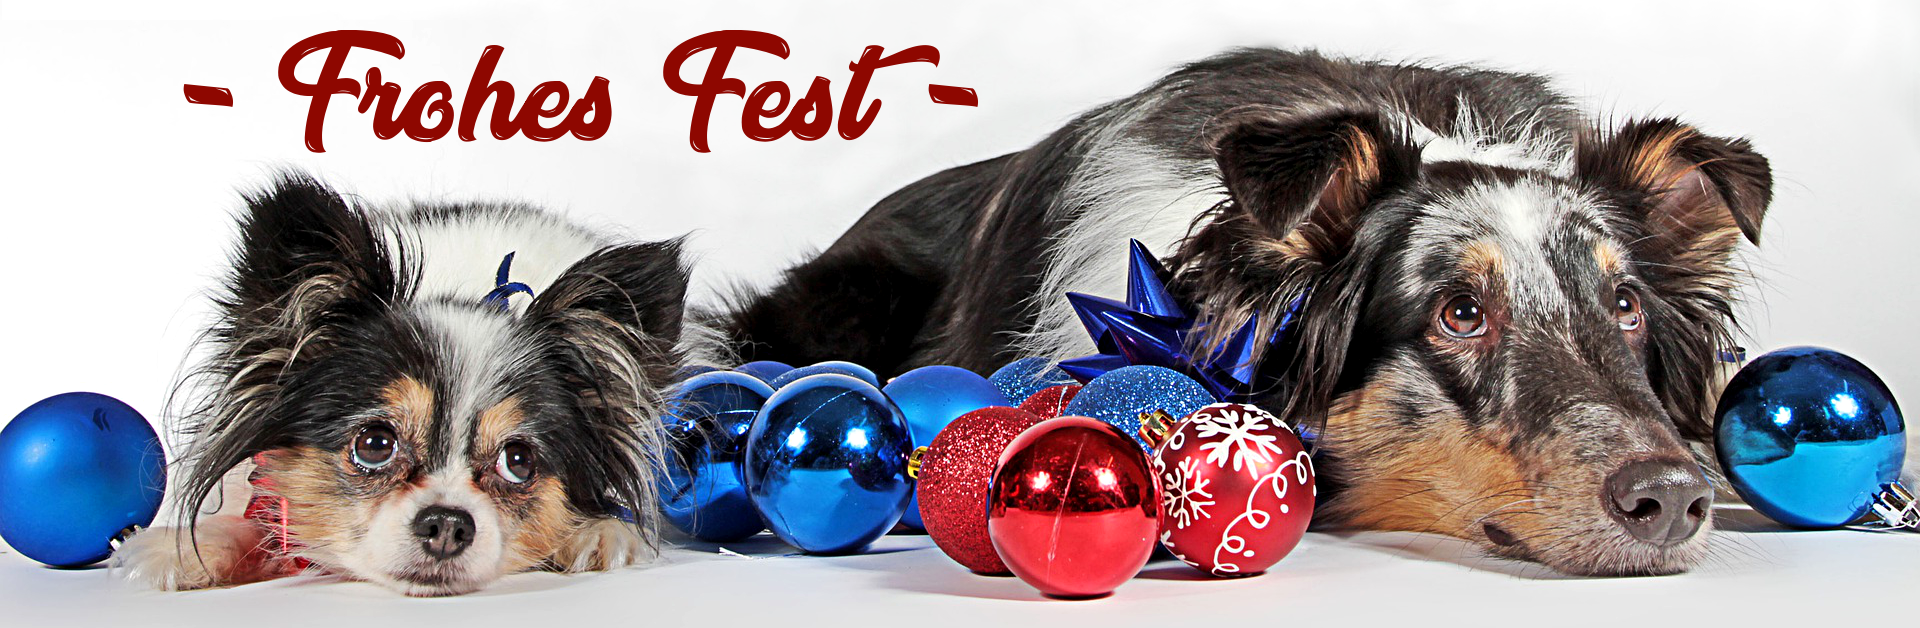 Frohes Fest Zauberhunde Hundephysio Wilsdruff